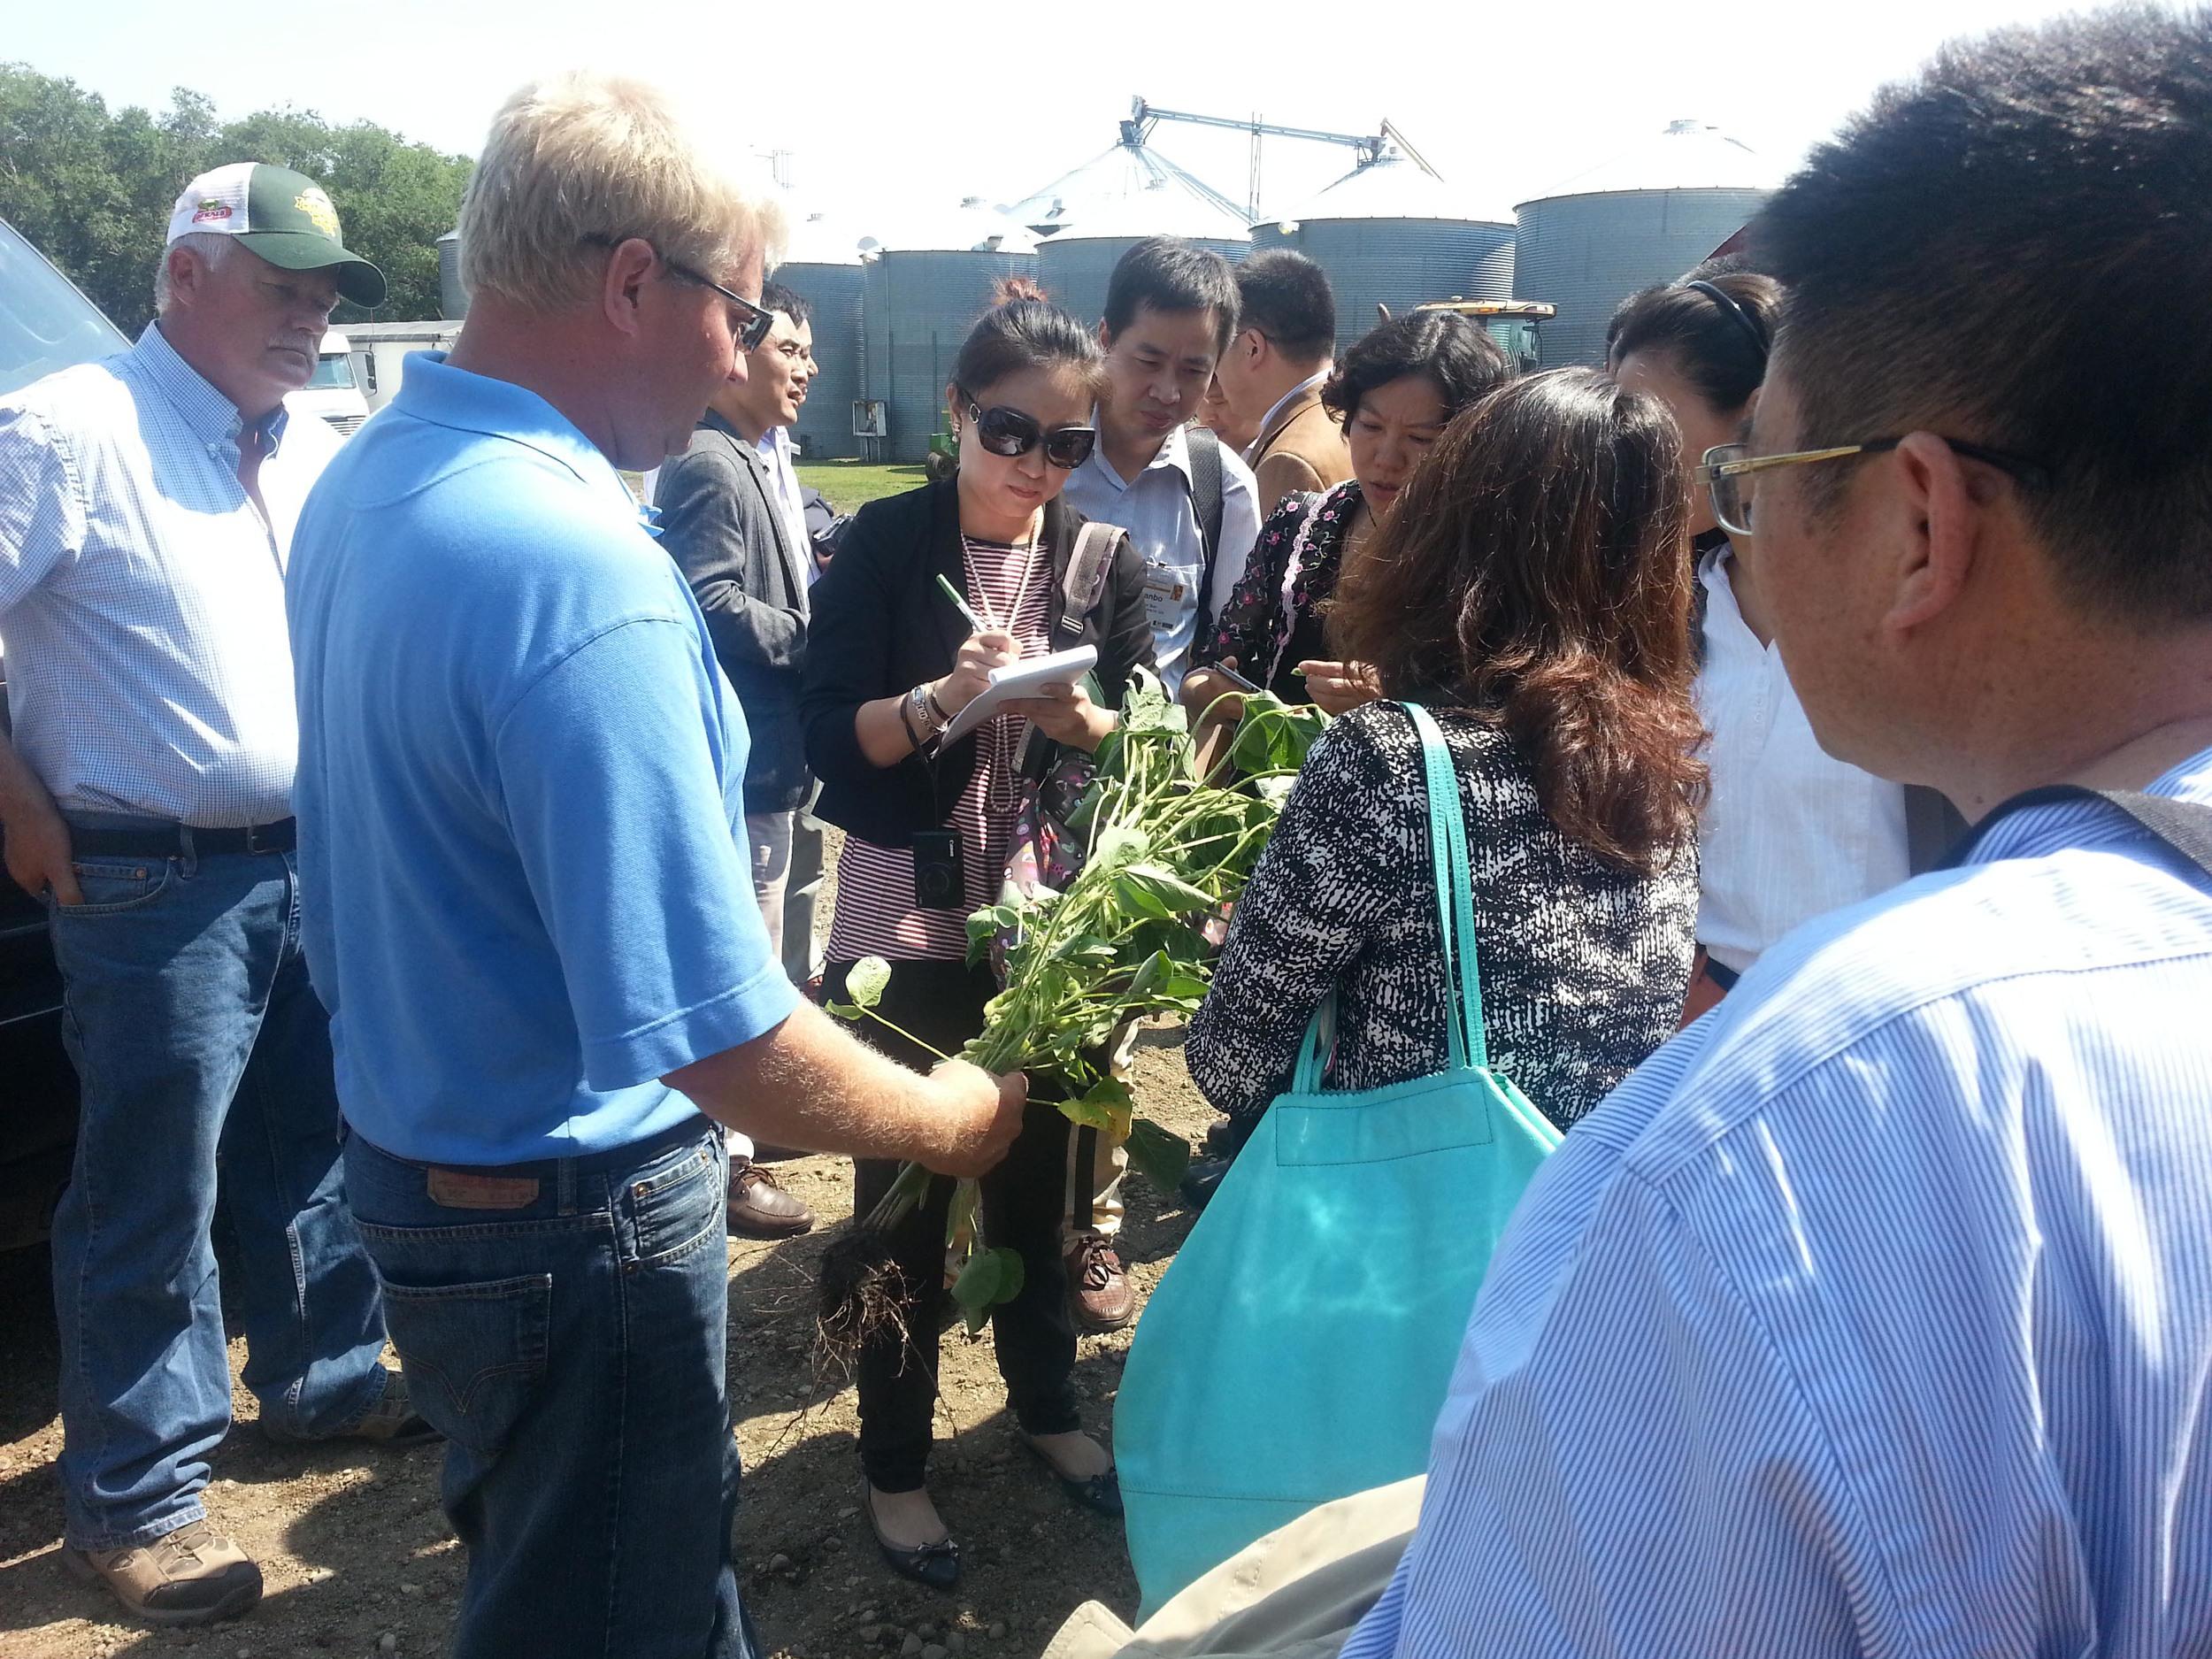 2014 China Feed Manufacturing SC at Scott Gauslow's farm 1.jpg